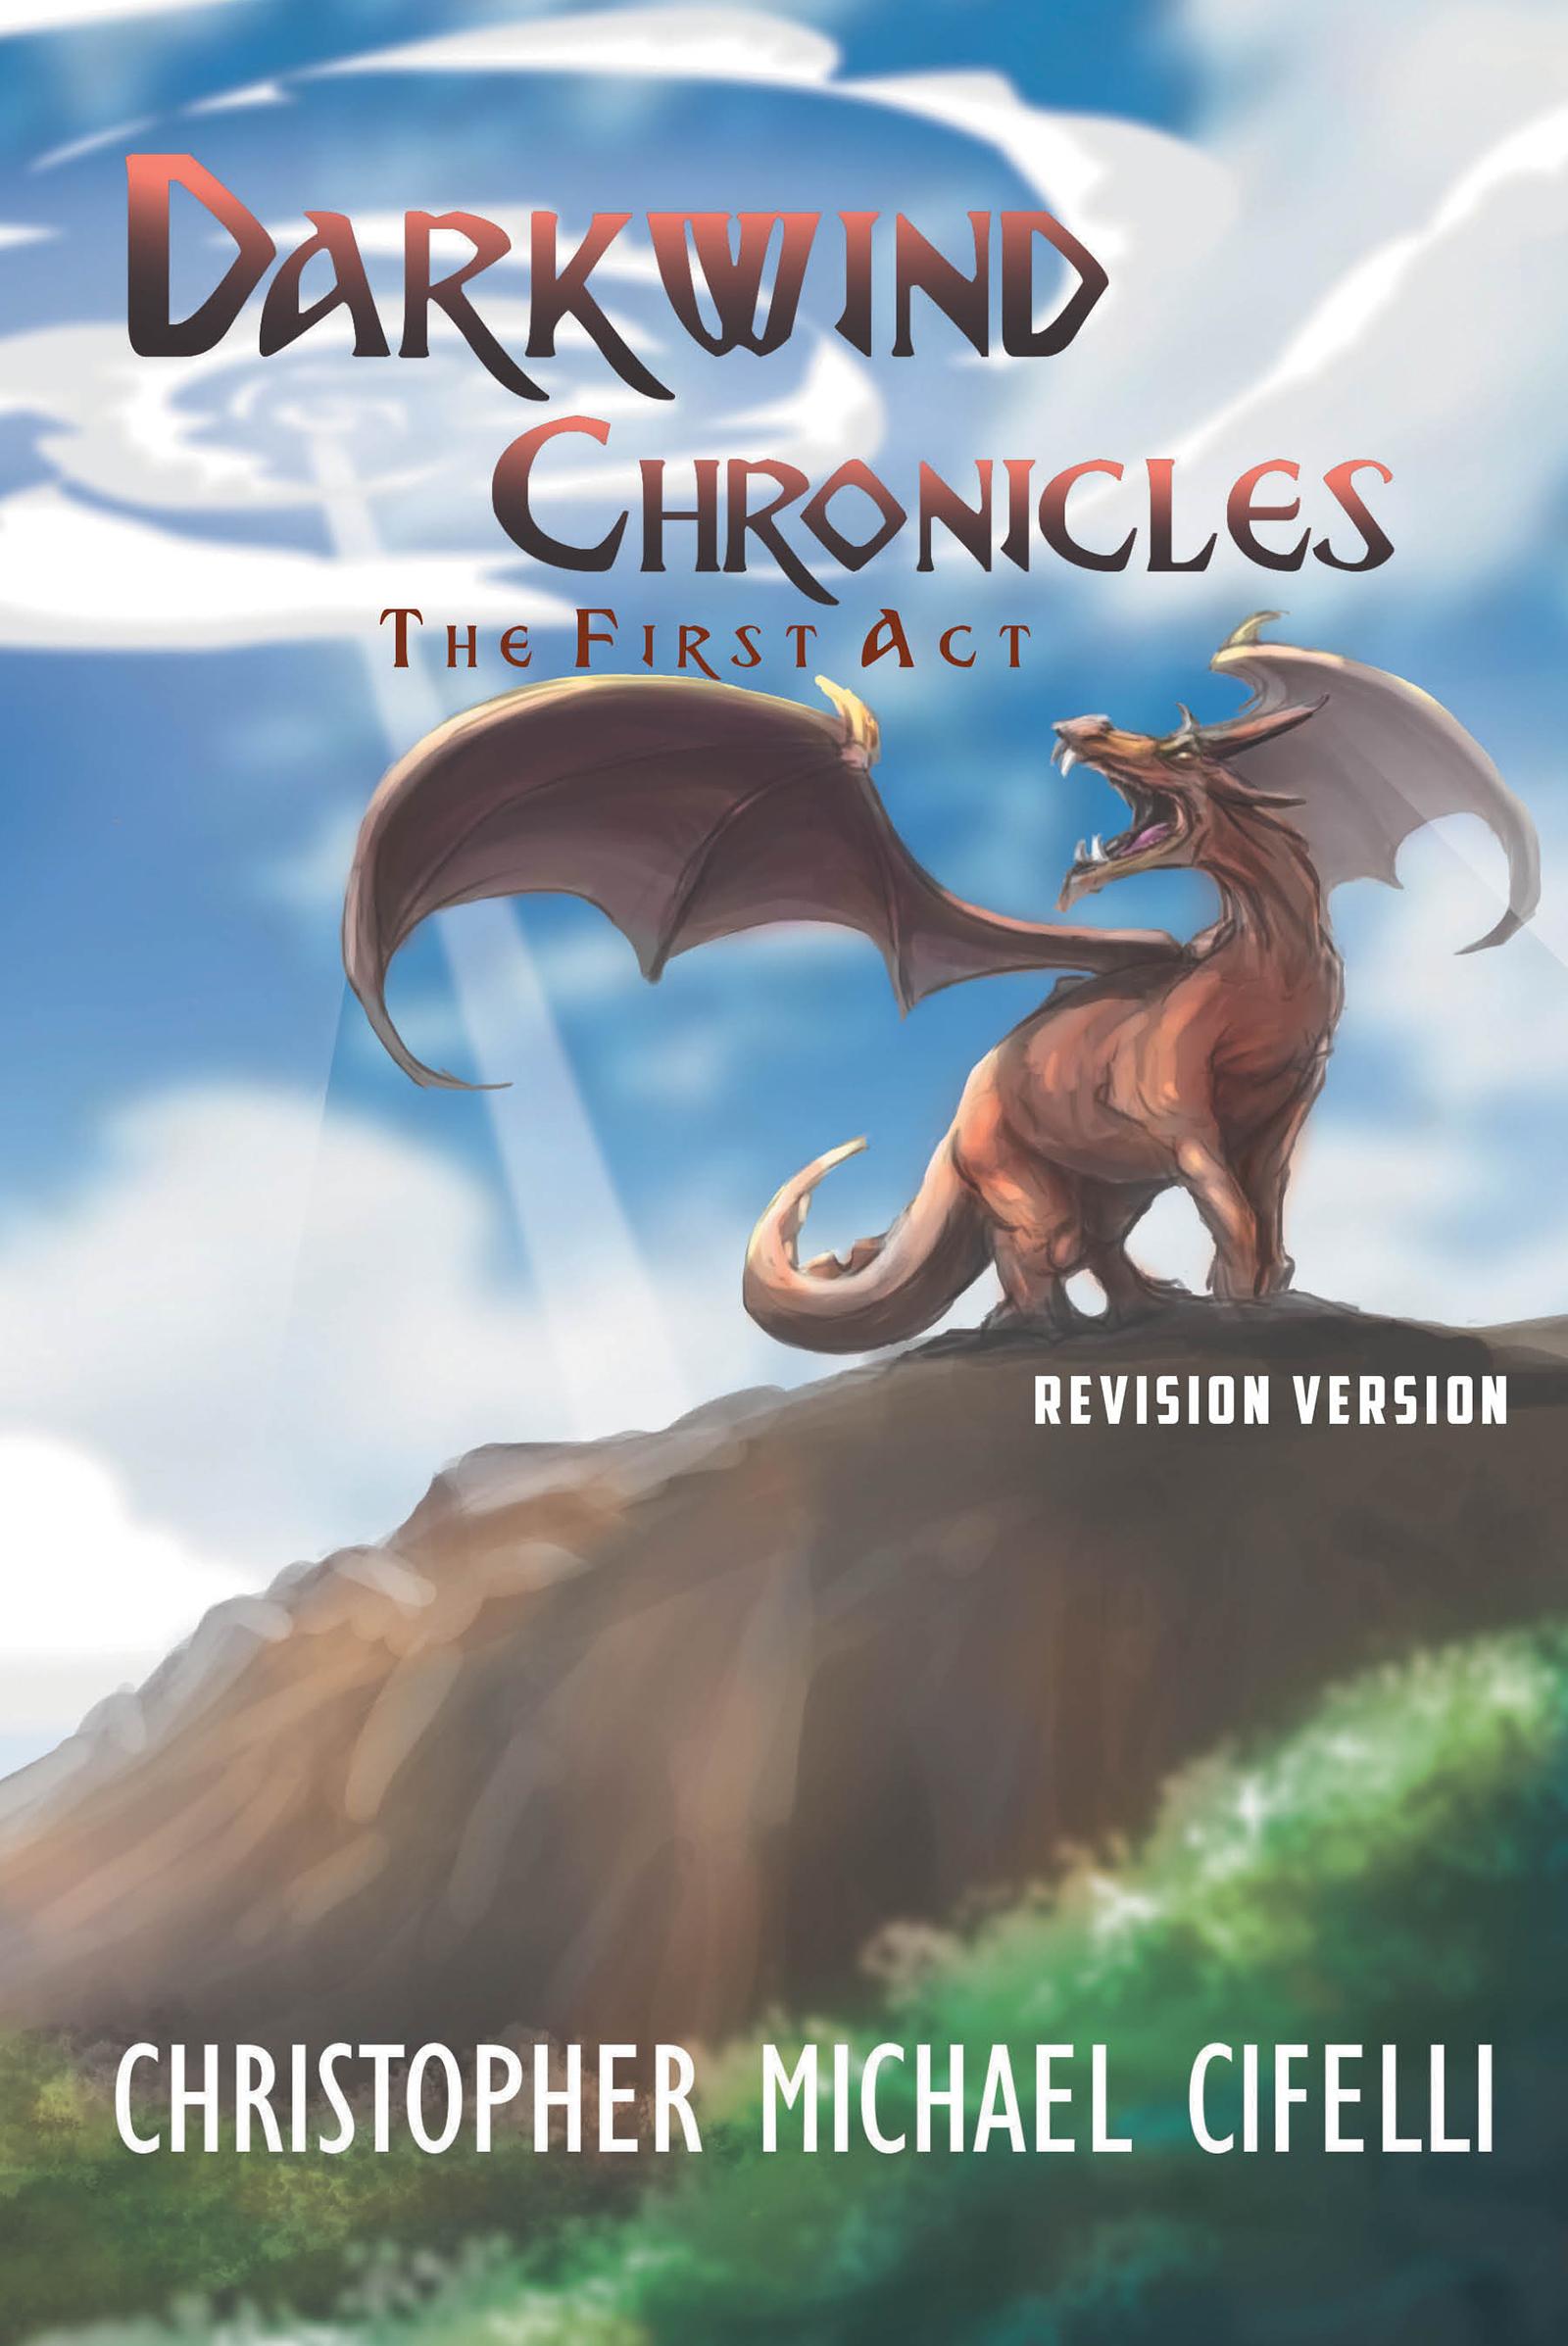 Author Christopher Cifelli Pens a Spell-binding Novel